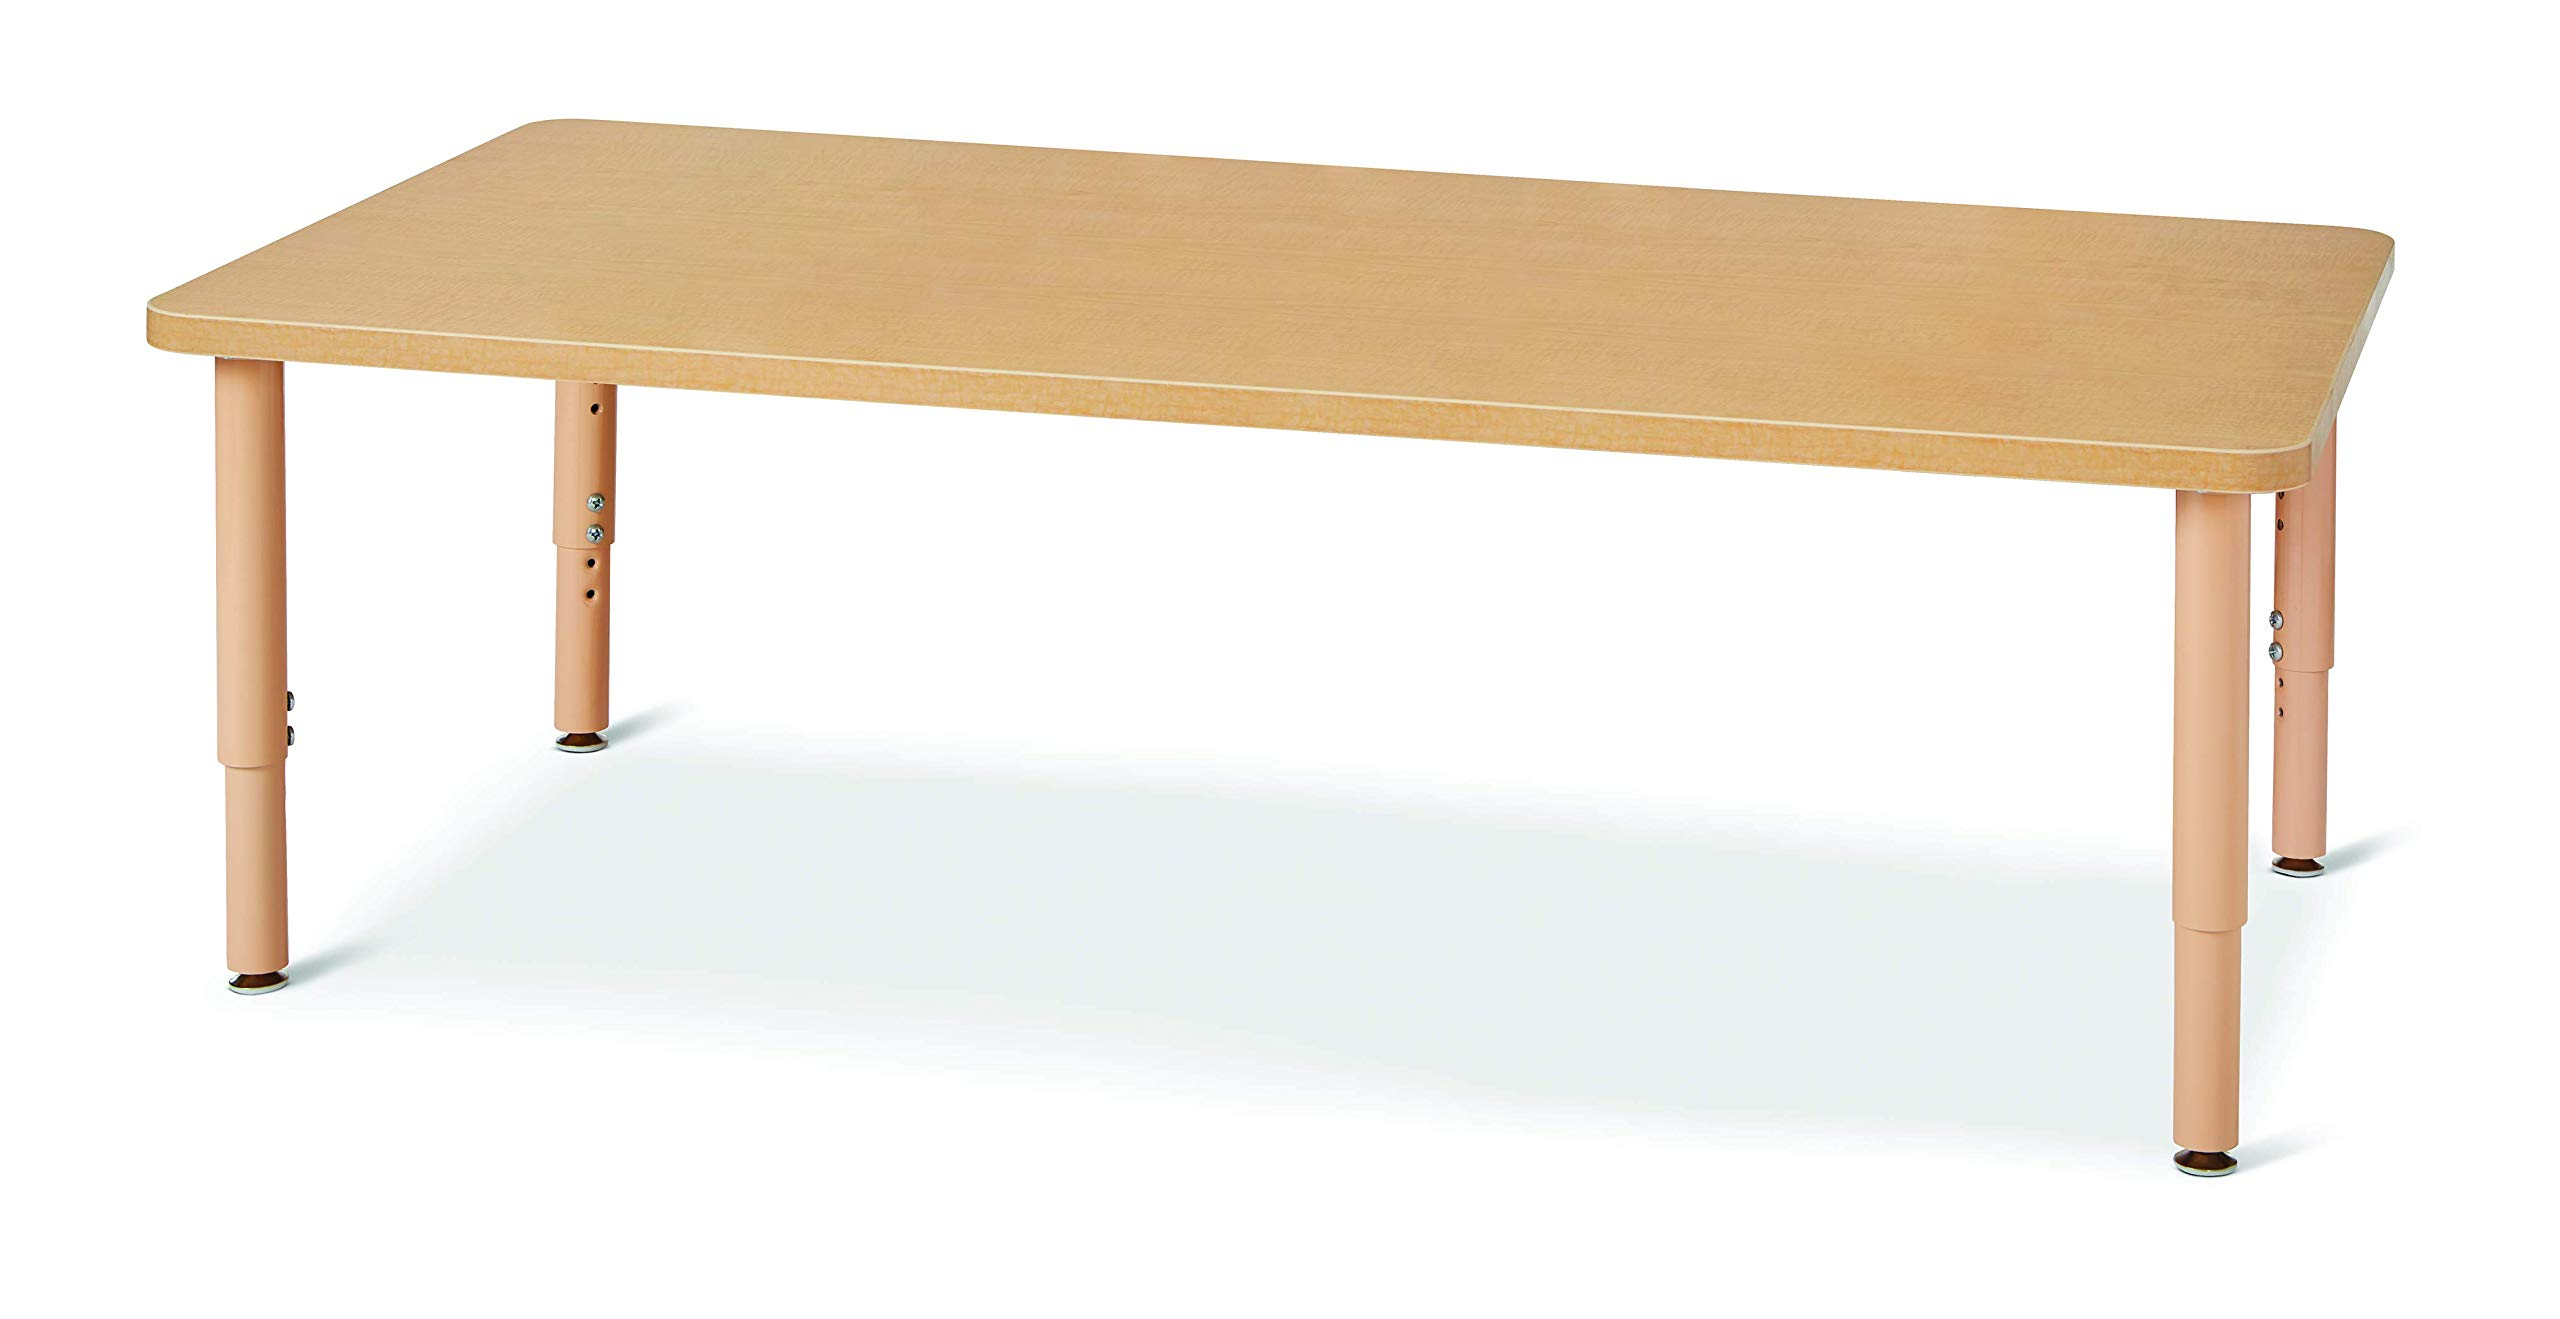 Jonti-Craft 6259JCP251 Purpose+ Rectangle Tables by Jonti-Craft